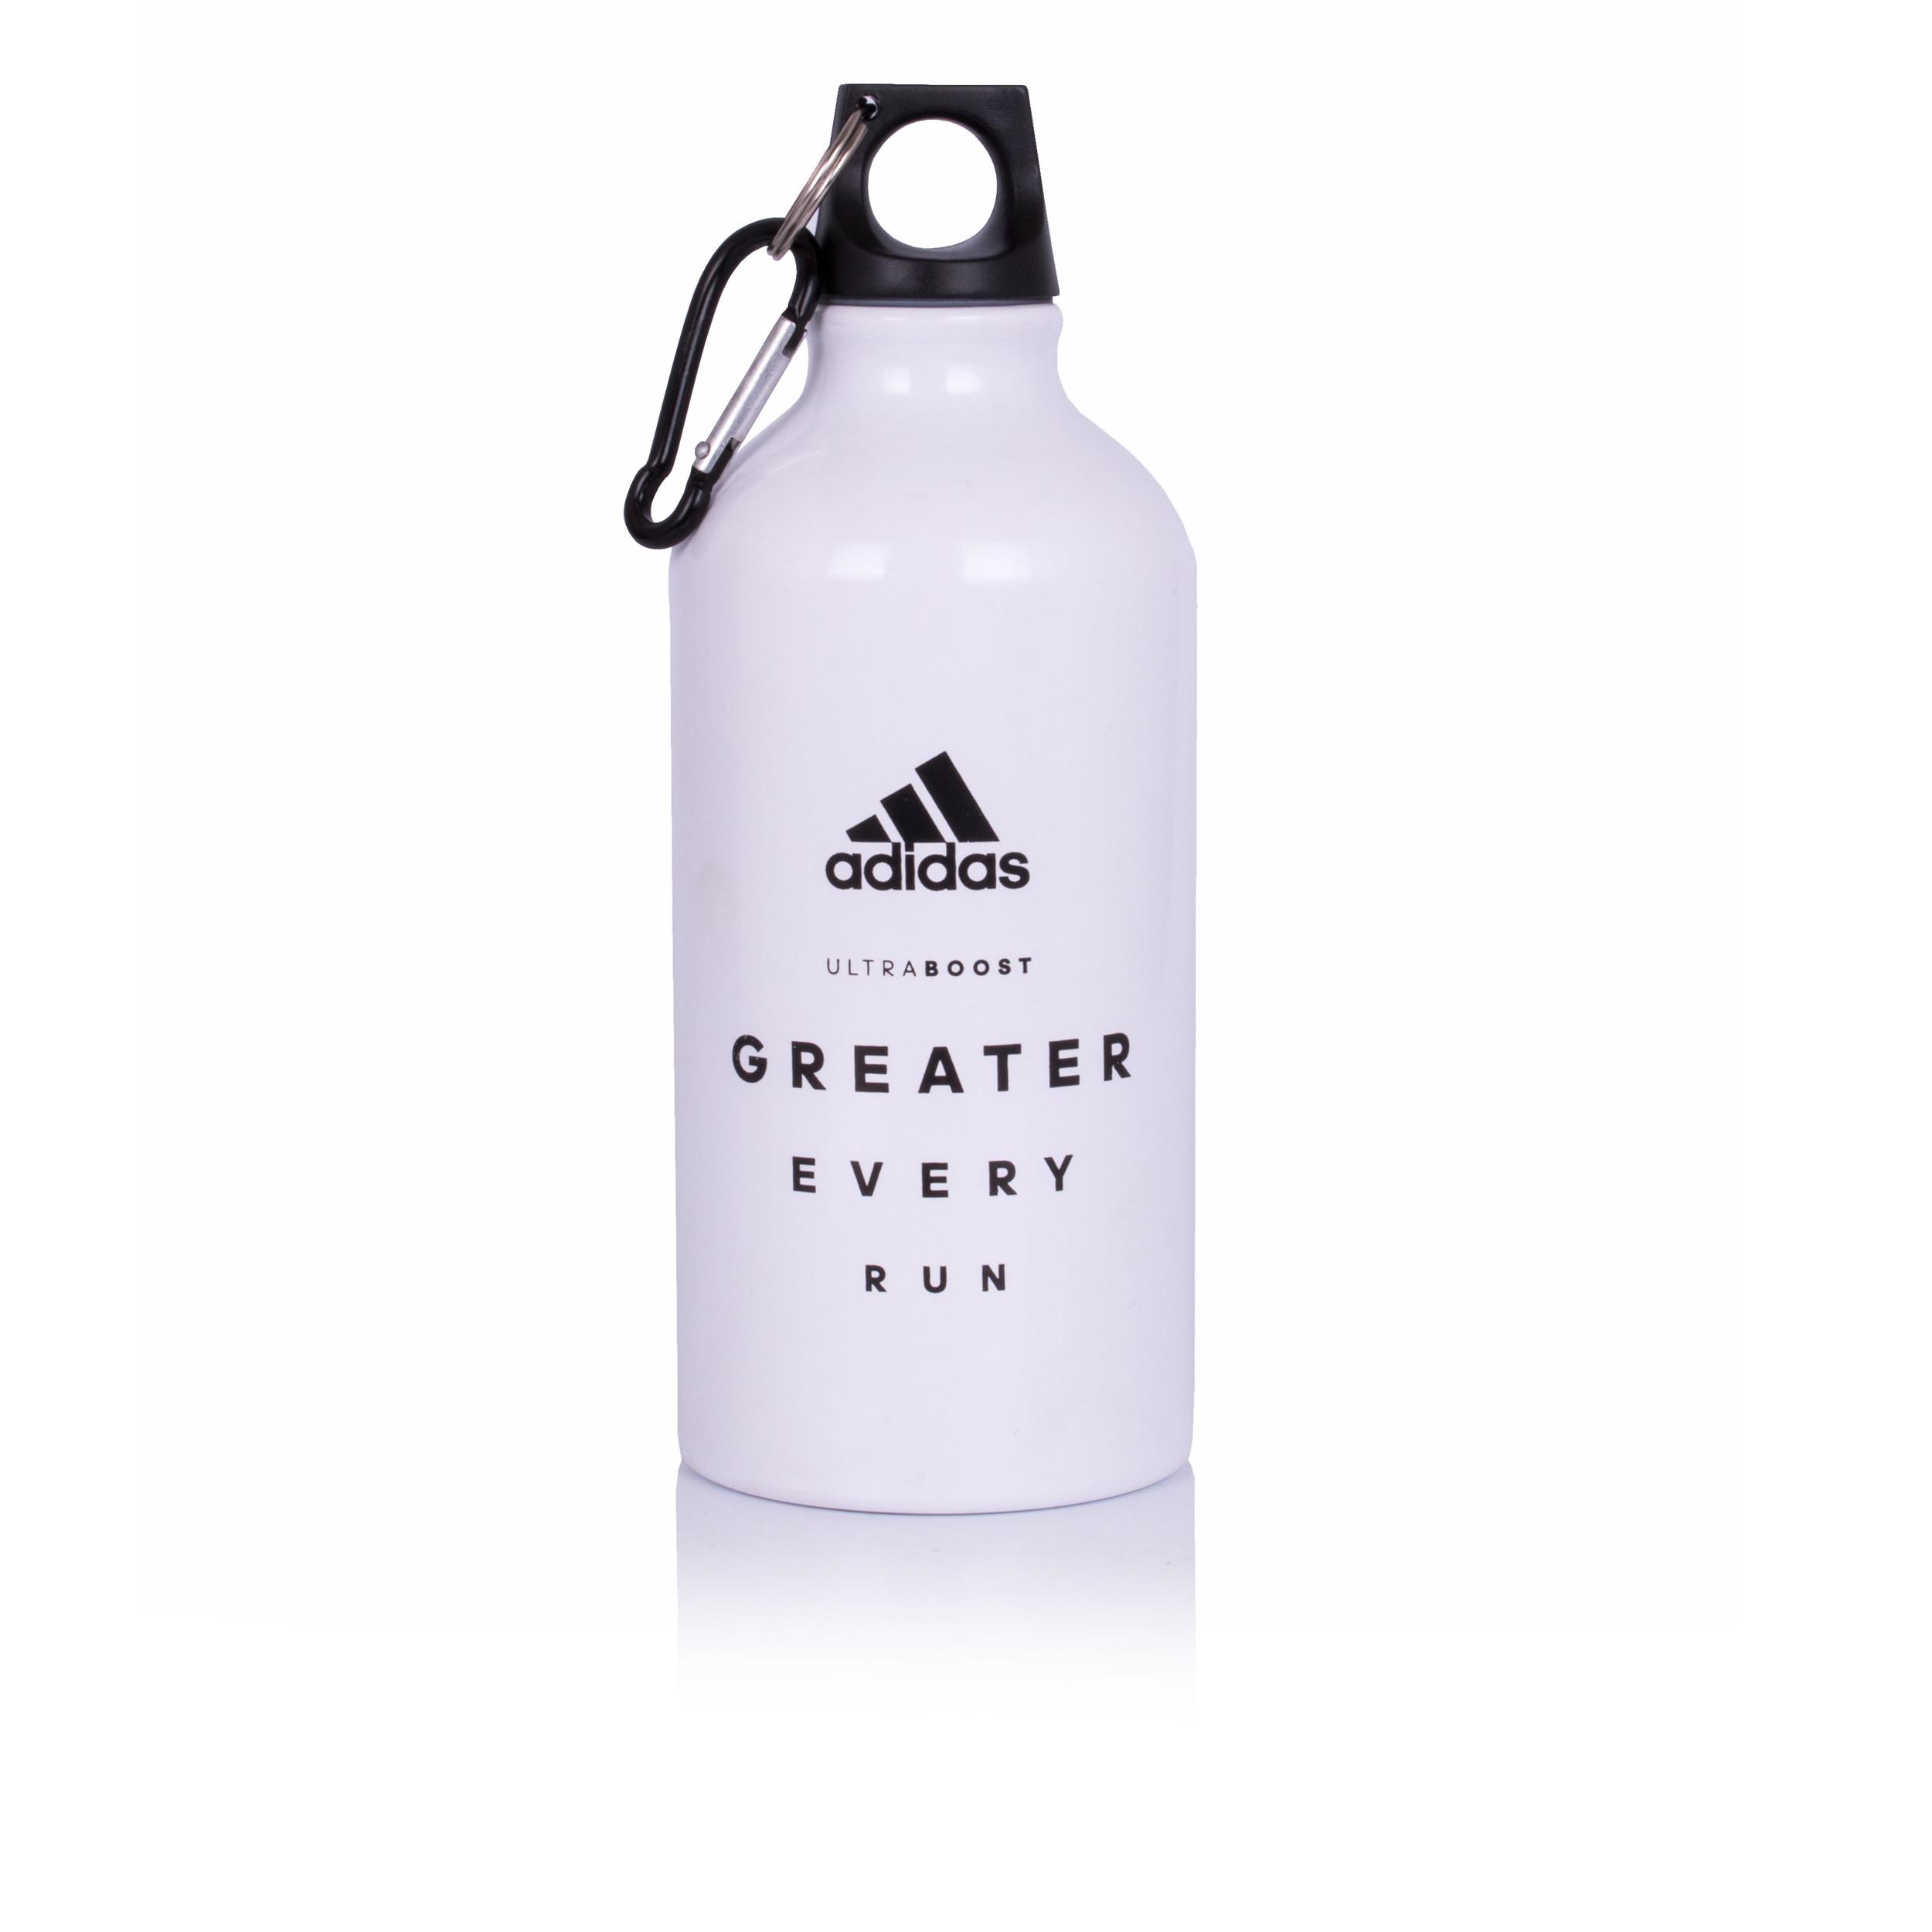 Adidas Drink Bottle